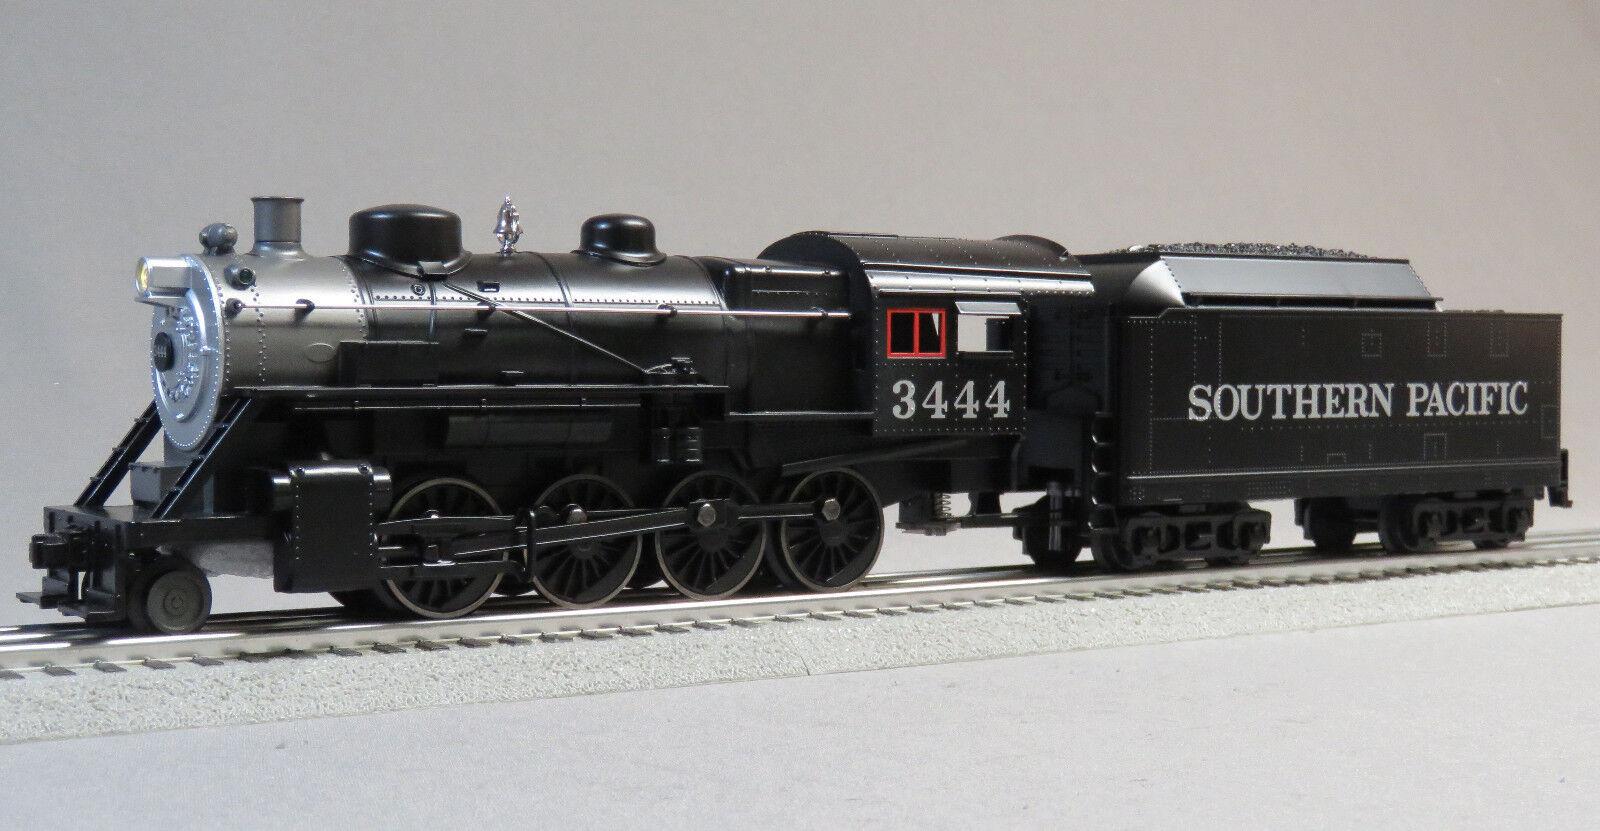 MTH RAIL KING SP STEAM ENGINE & TENDER PredO 3 O GAUGE train 30-4245-1-E NEW